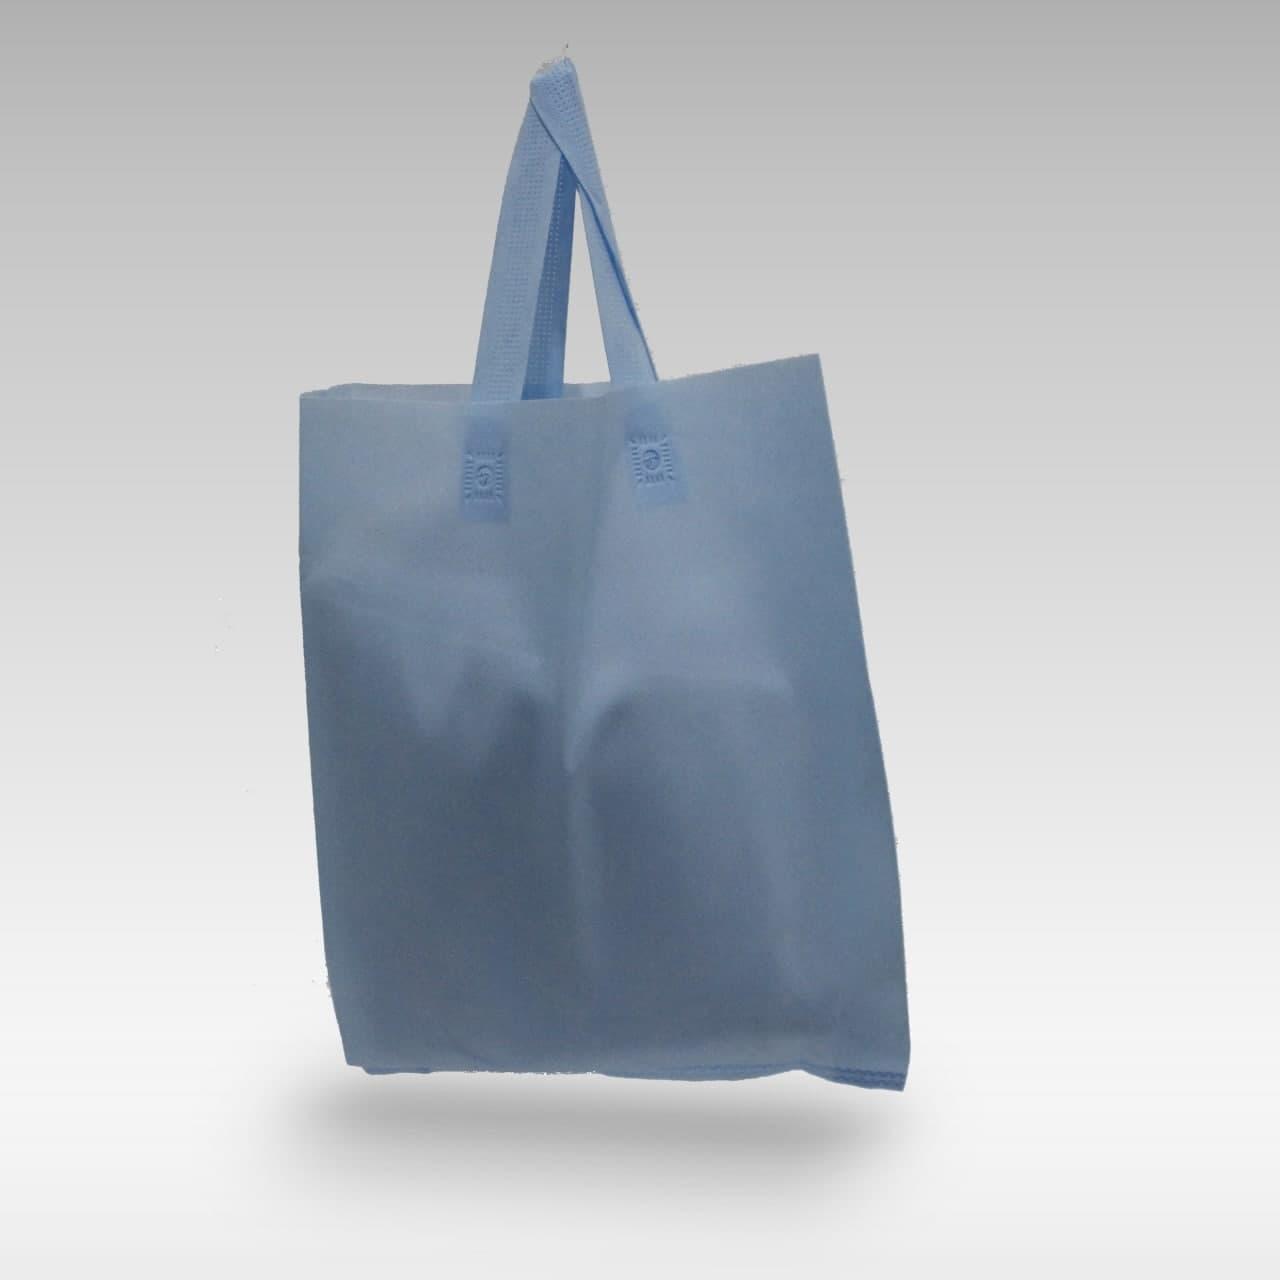 Jual Goodie Bag Polos Terdekar